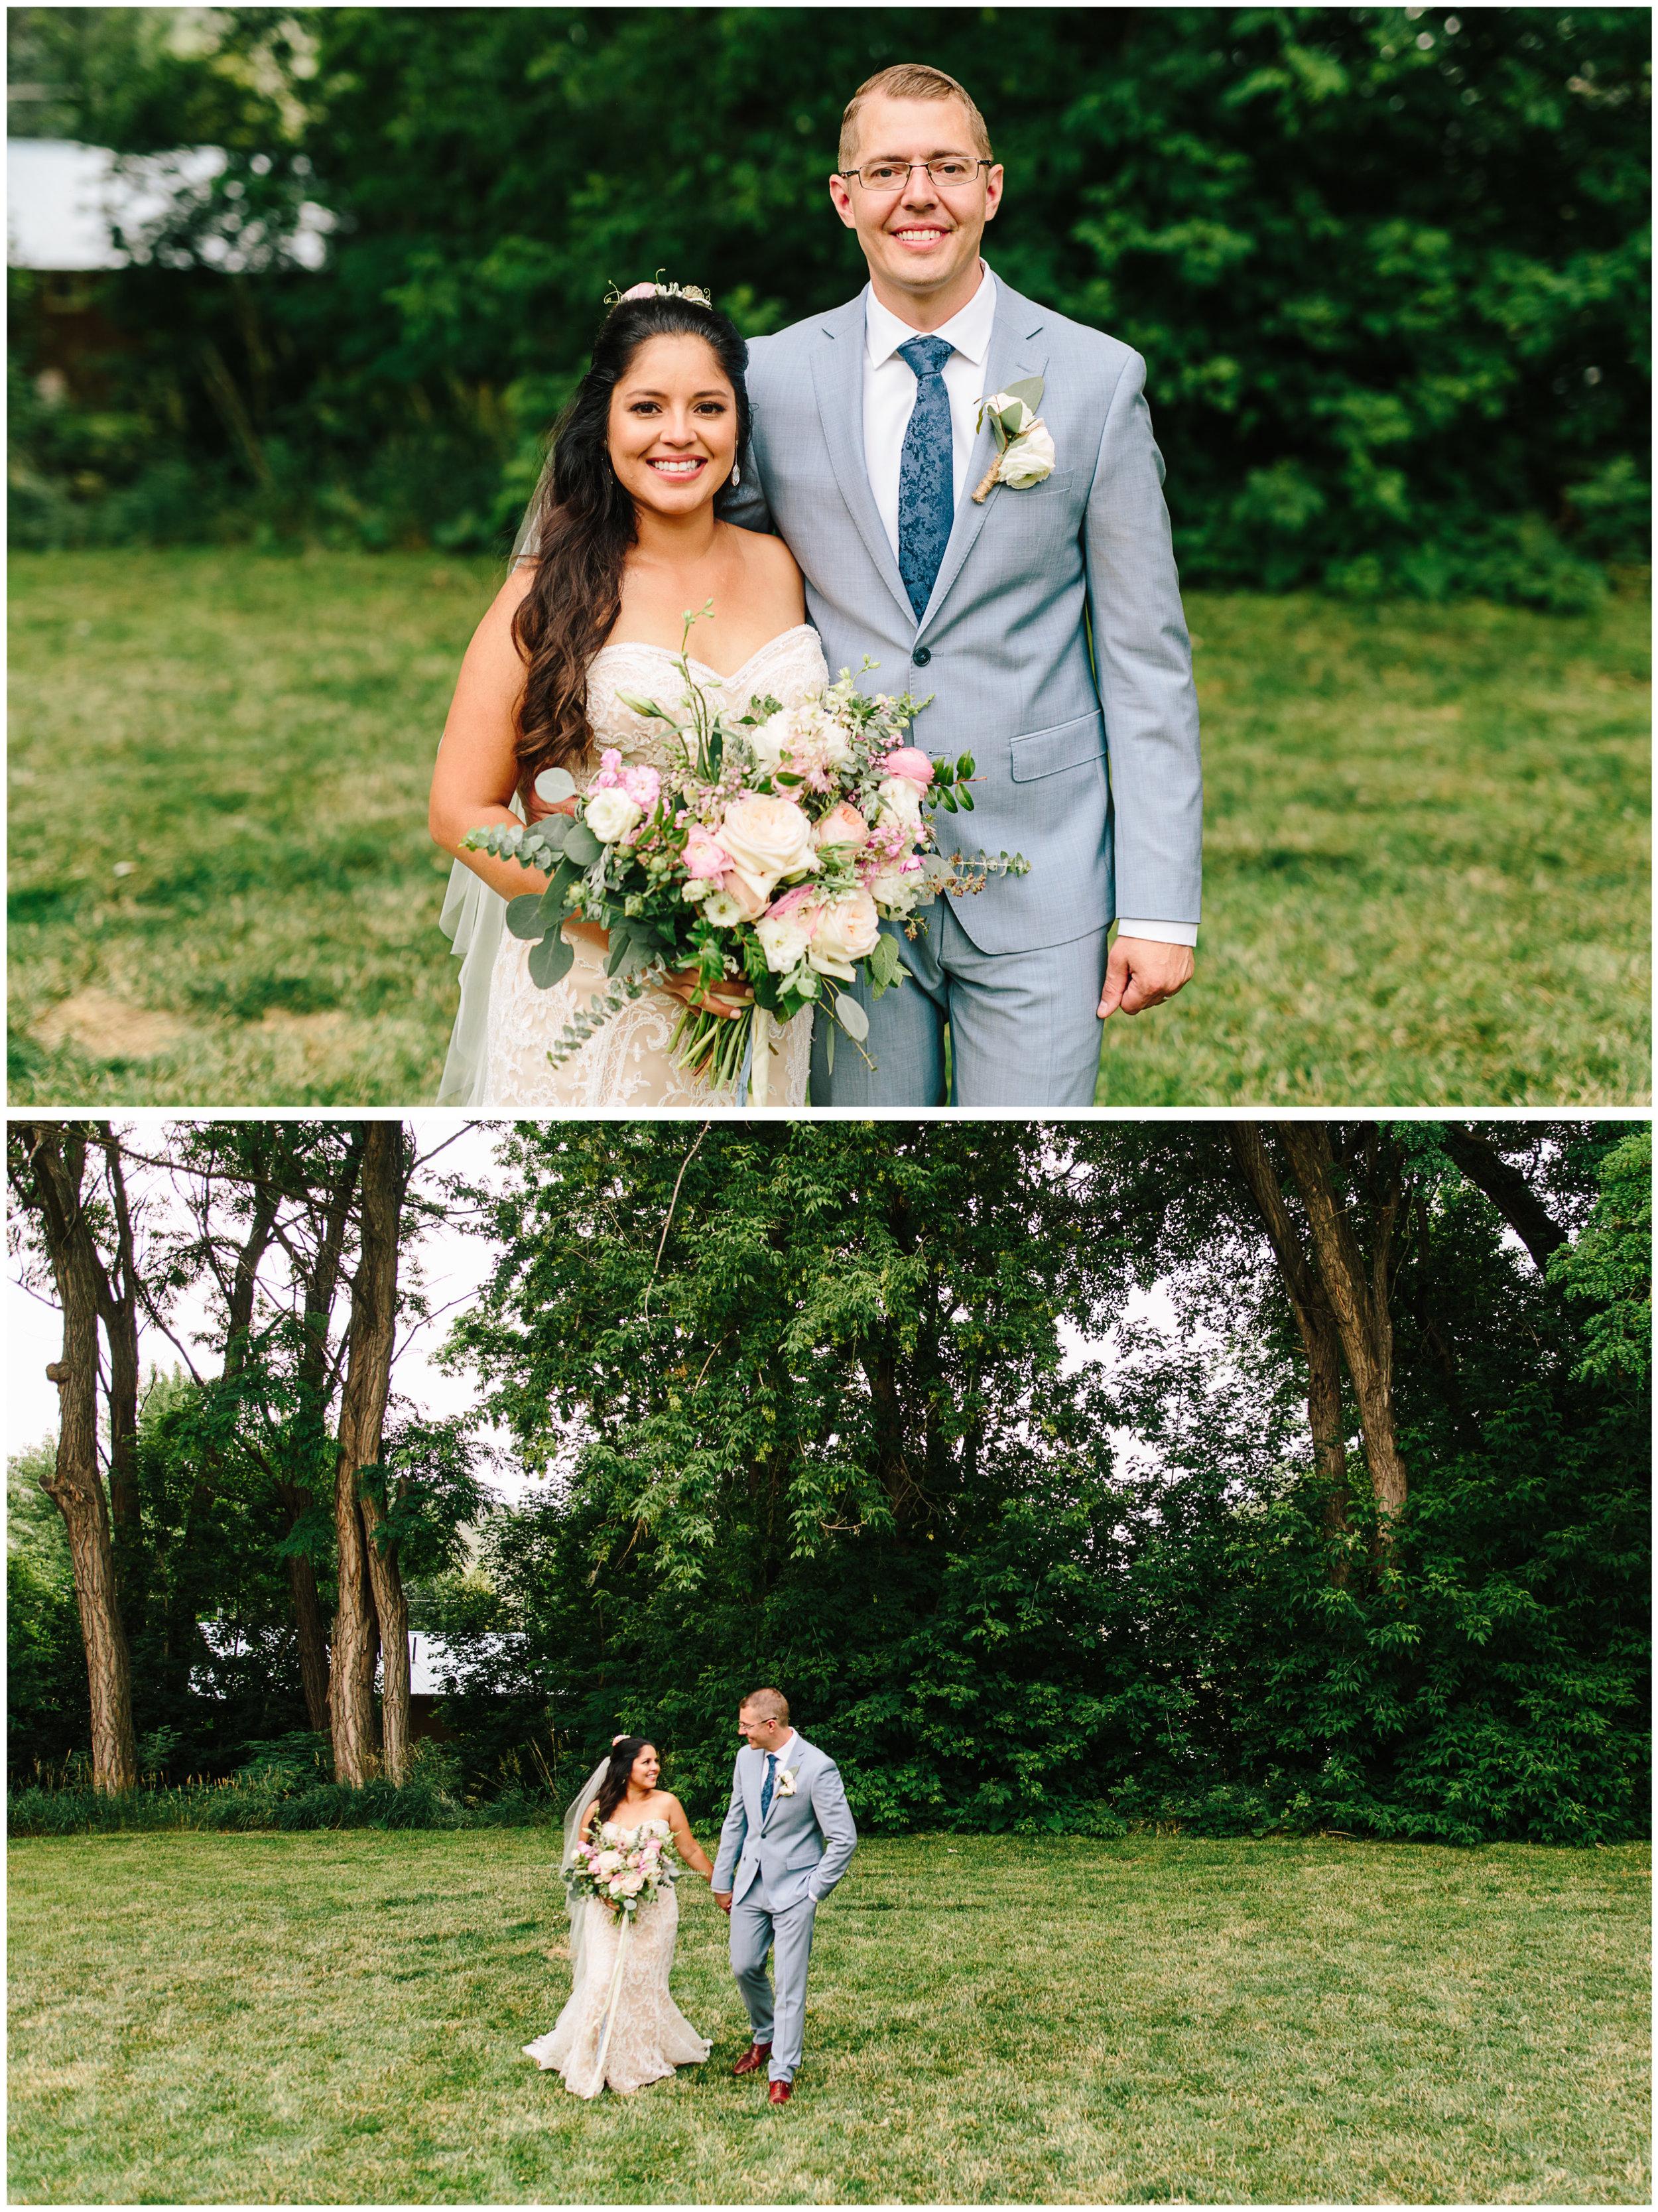 lyons_farmette_wedding_39.jpg